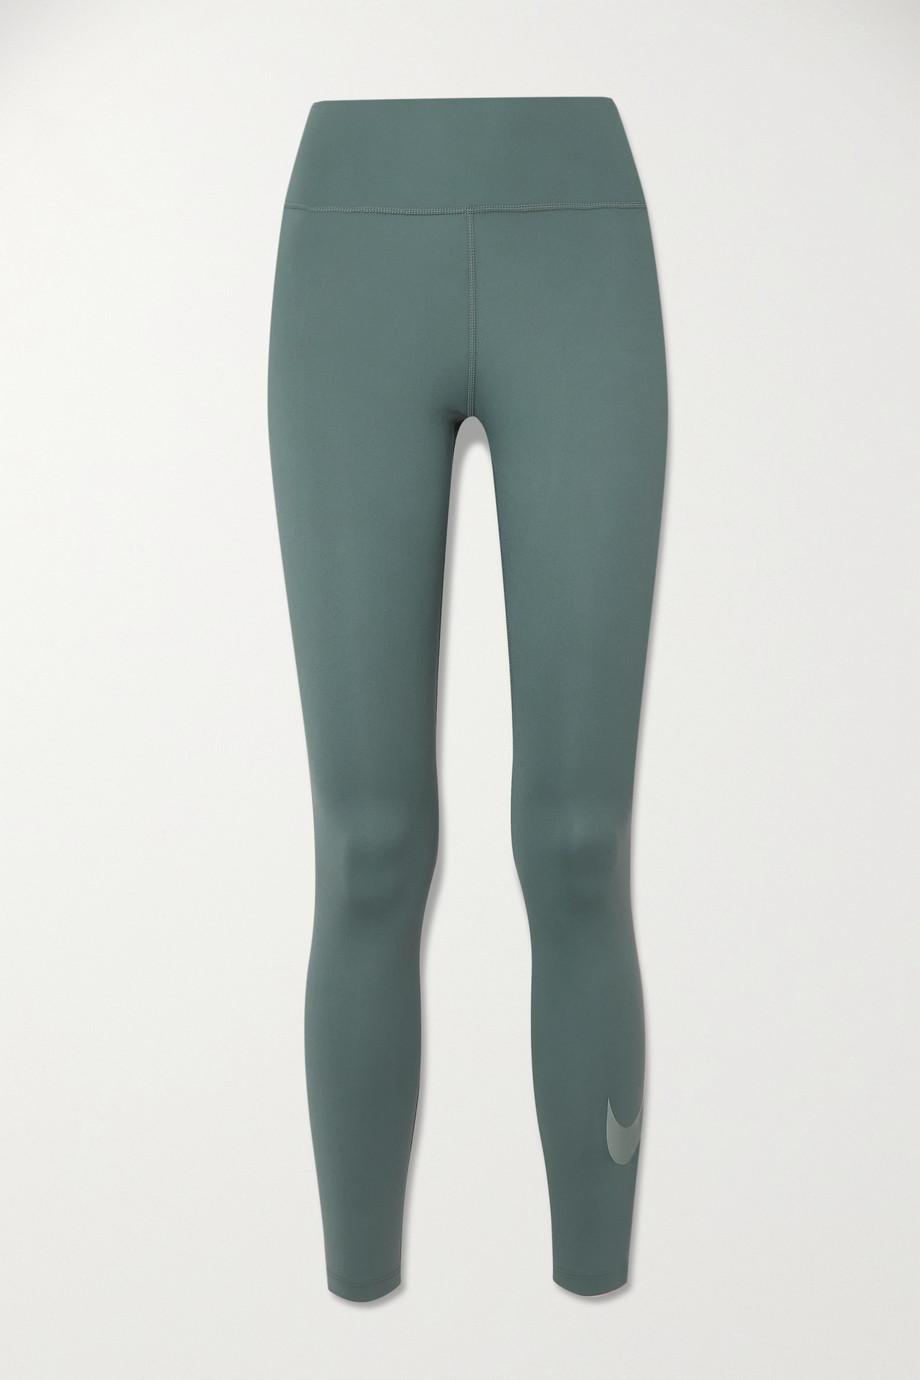 Nike One Icon Clash Dri-FIT leggings